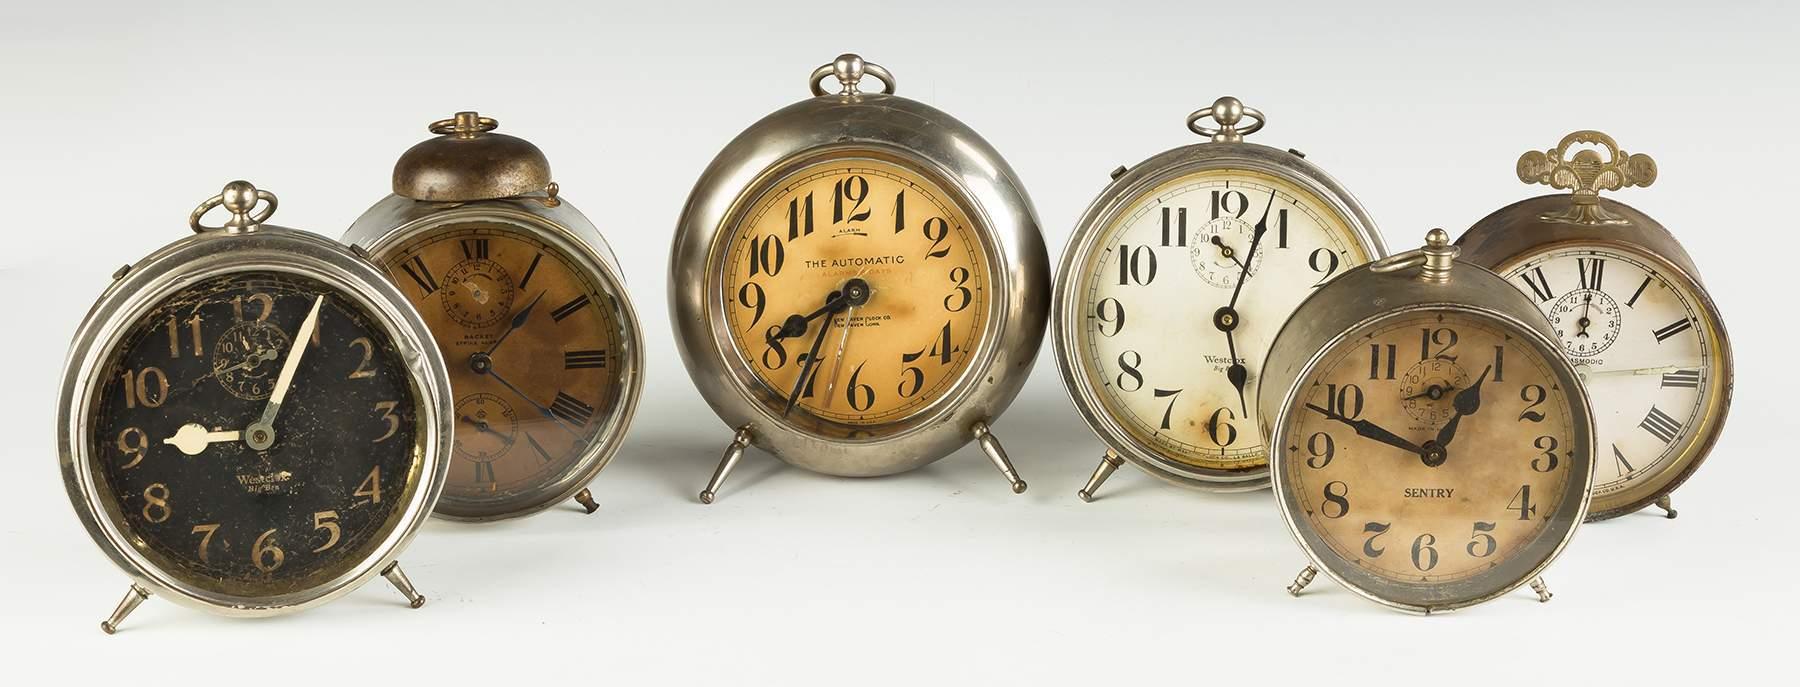 Group of Vintage Alarm Clocks | Cottone Auctions